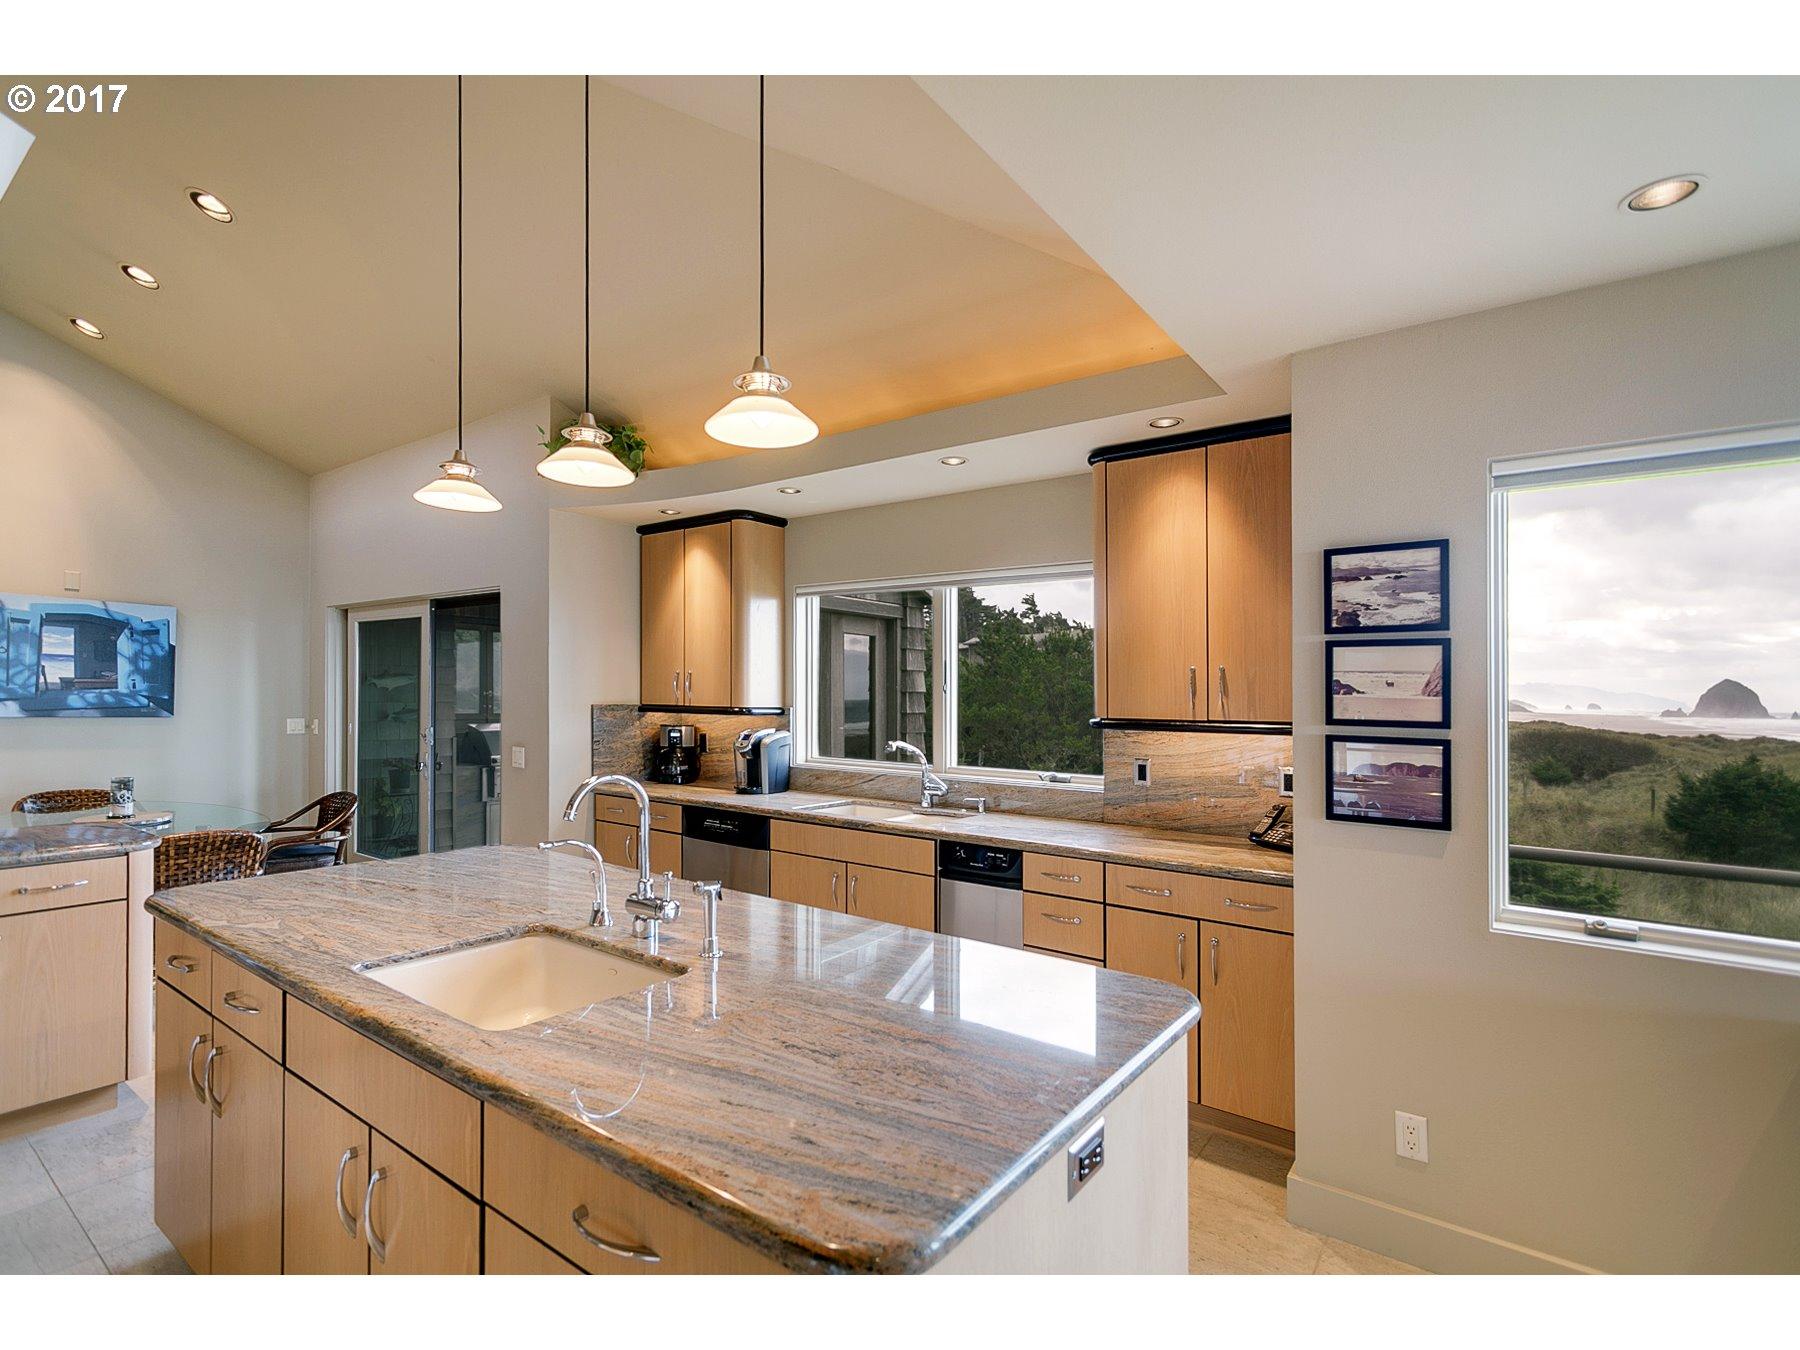 640 N Oak ST Cannon Beach, OR 97110 - MLS #: 17612656